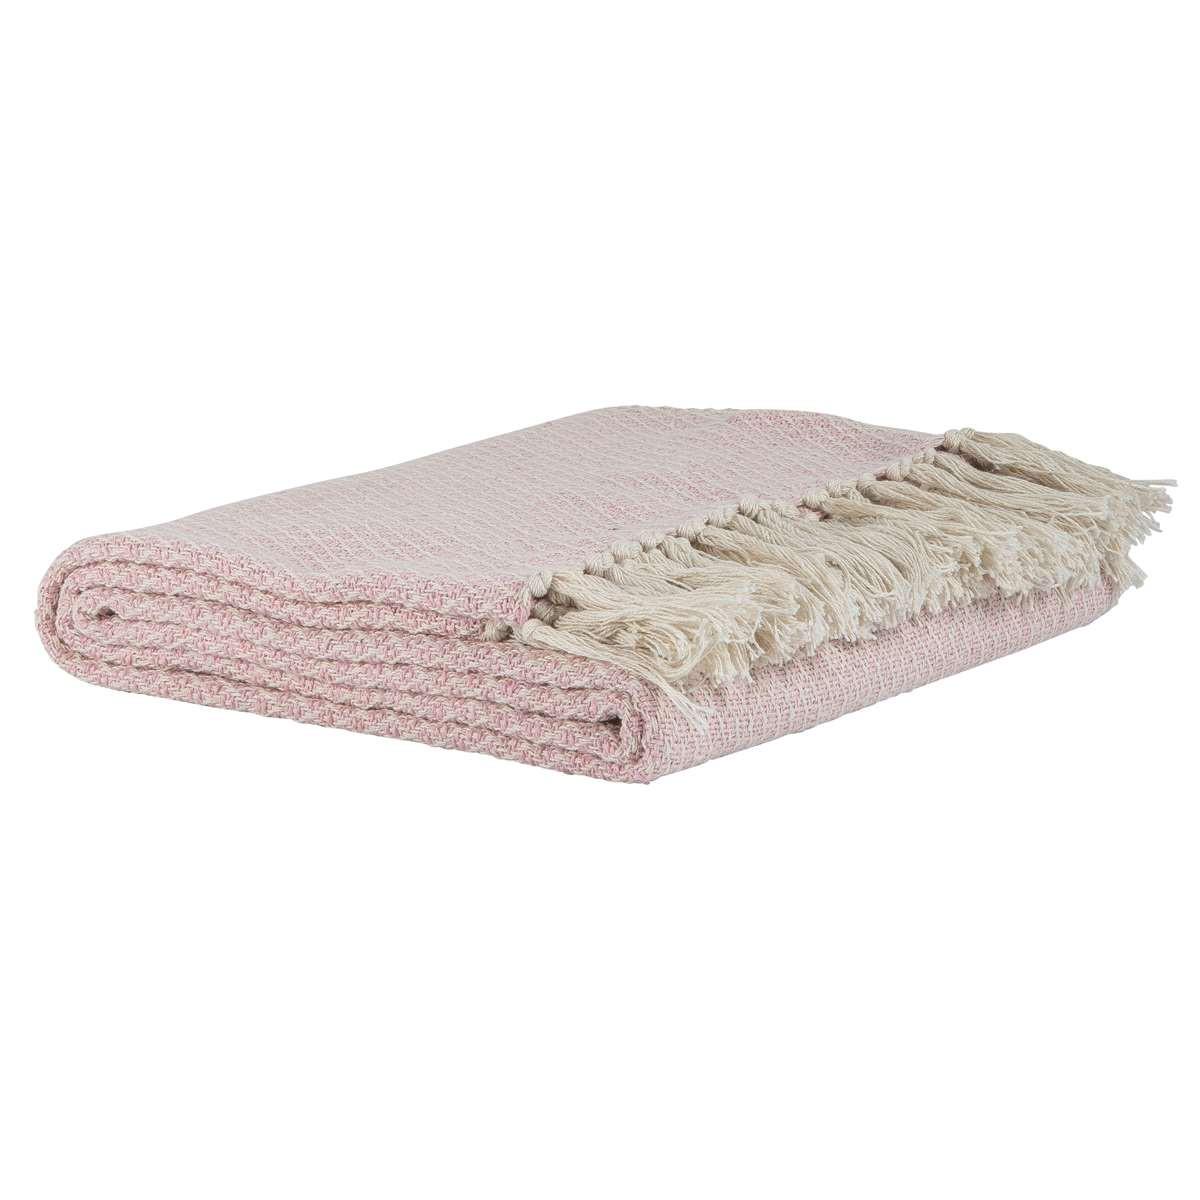 ib laursen plaid creme rosa karo muster wolldecke aus baumwolle creme farbig mit hellrosa. Black Bedroom Furniture Sets. Home Design Ideas